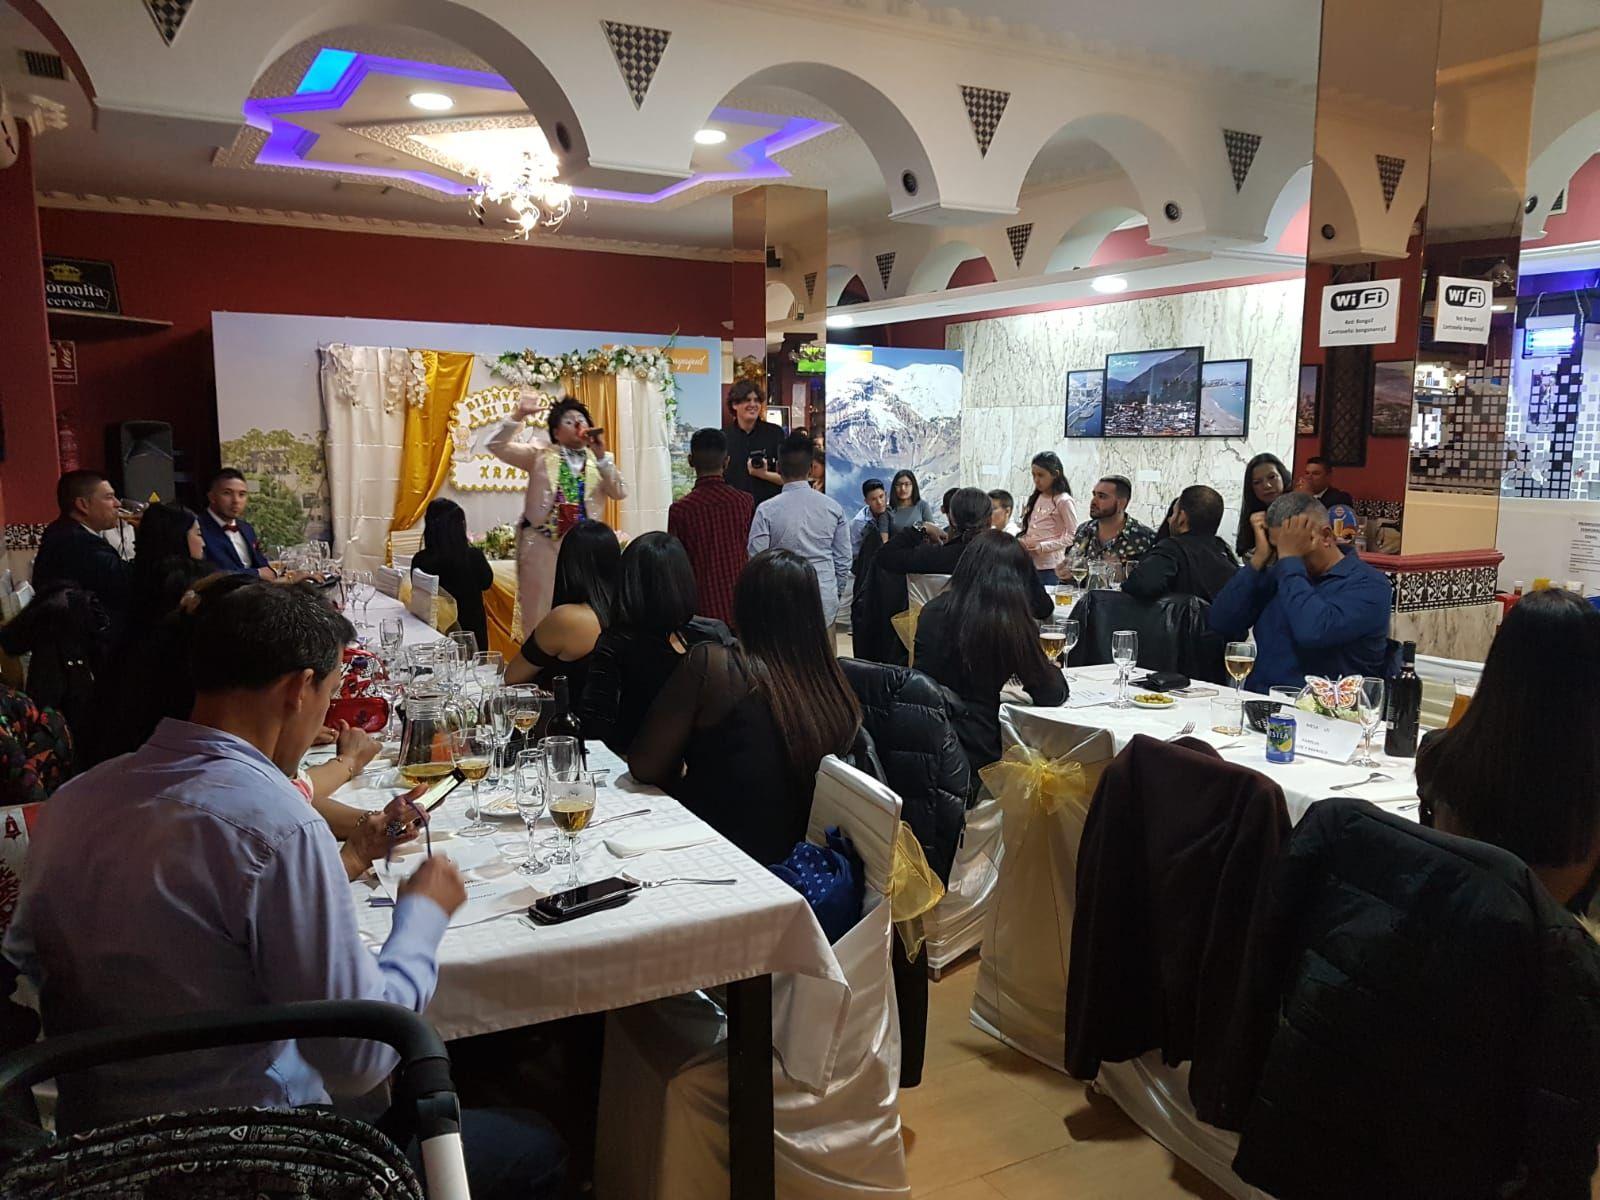 Comida ecuatoriana a domicilio Villaverde Madrid